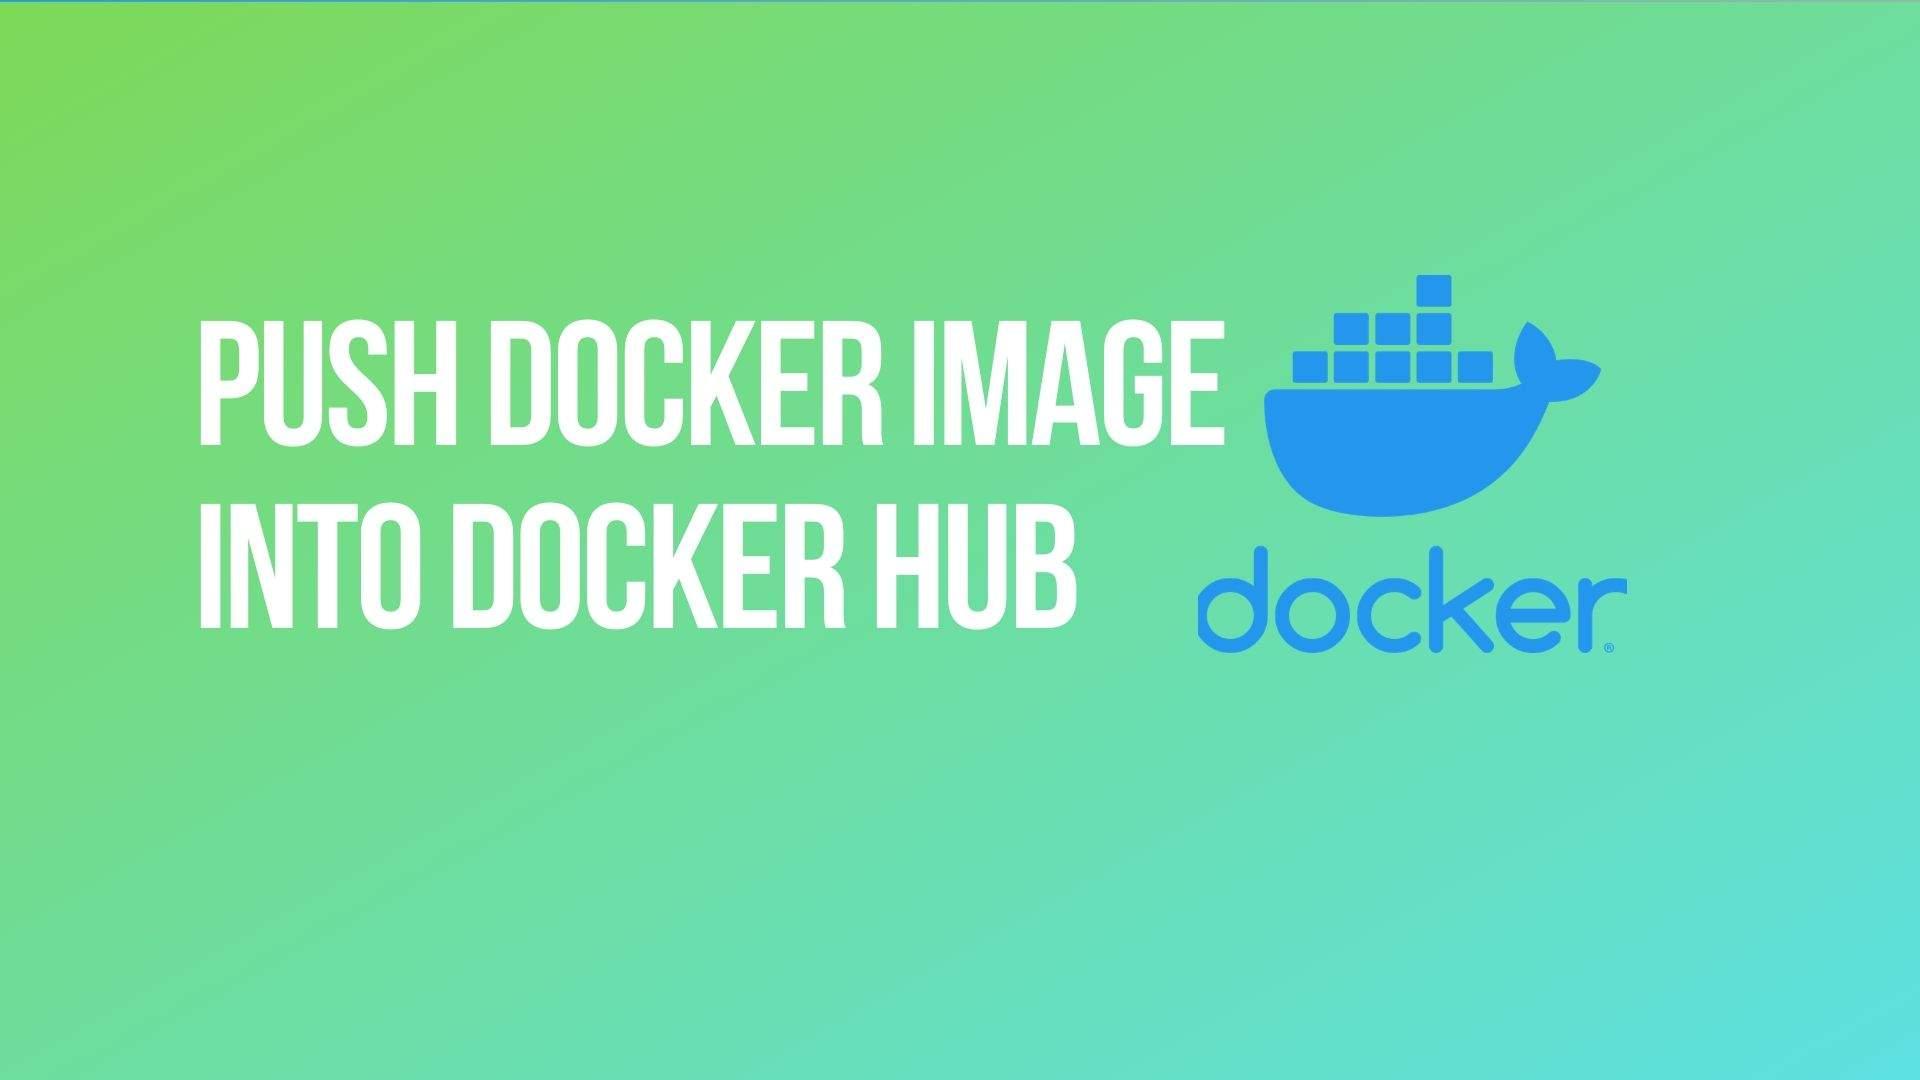 Push Docker Image into Docker Hub